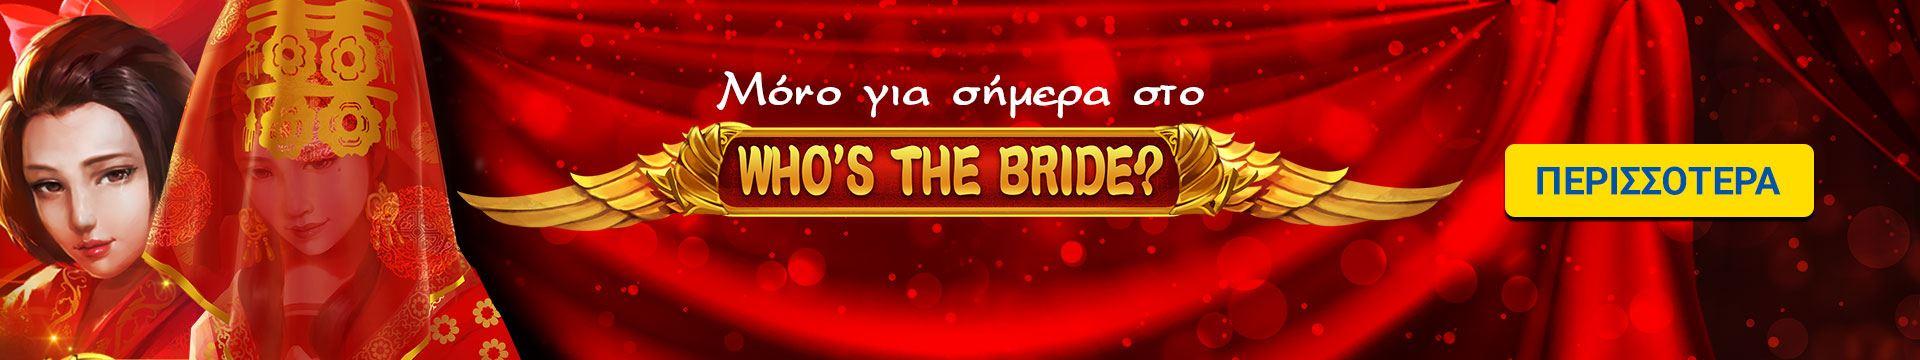 who_the_bride_challenge